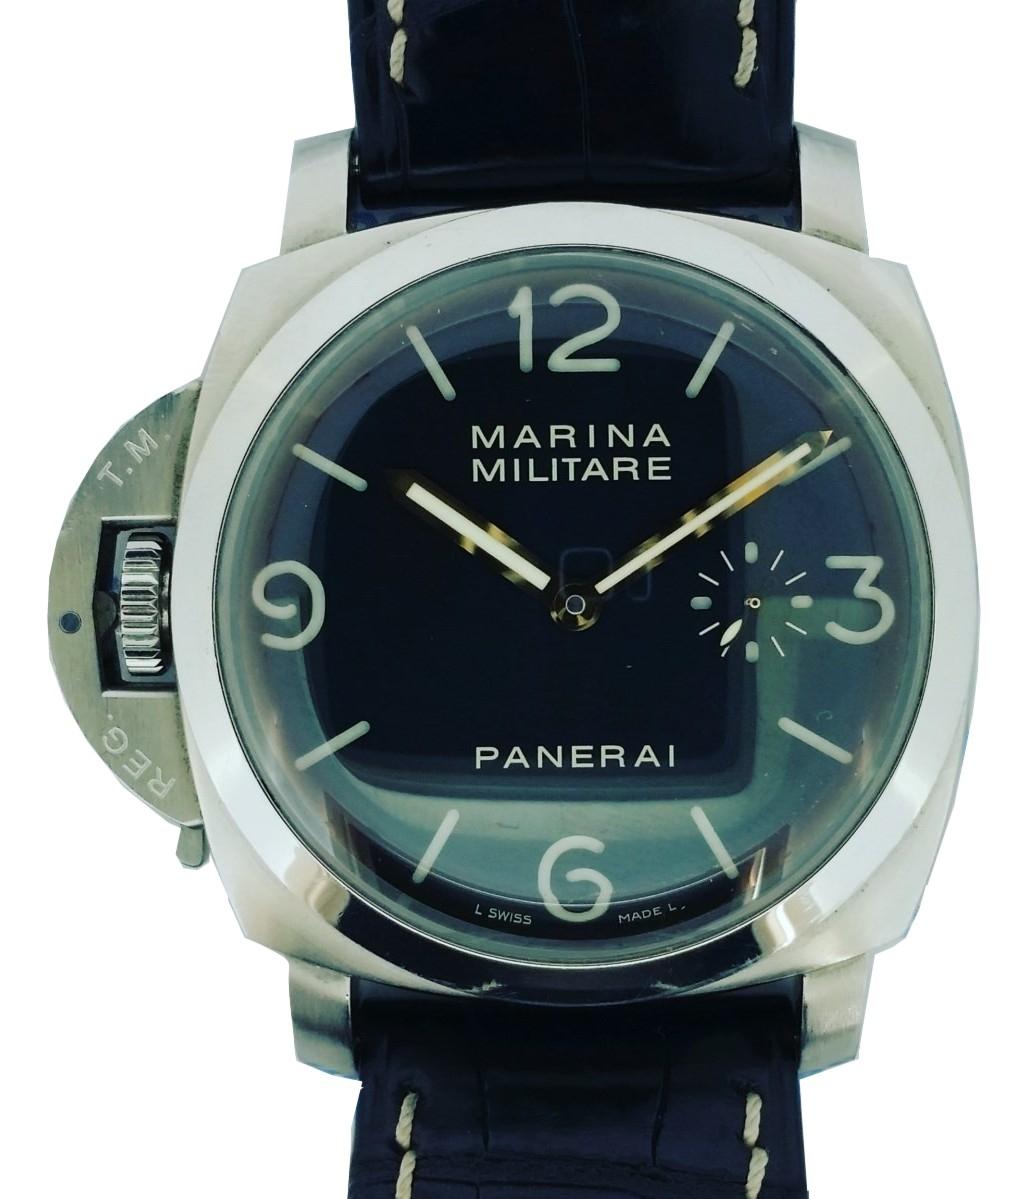 Montre occasion Panerai Marina Militare Destro PAM00217.